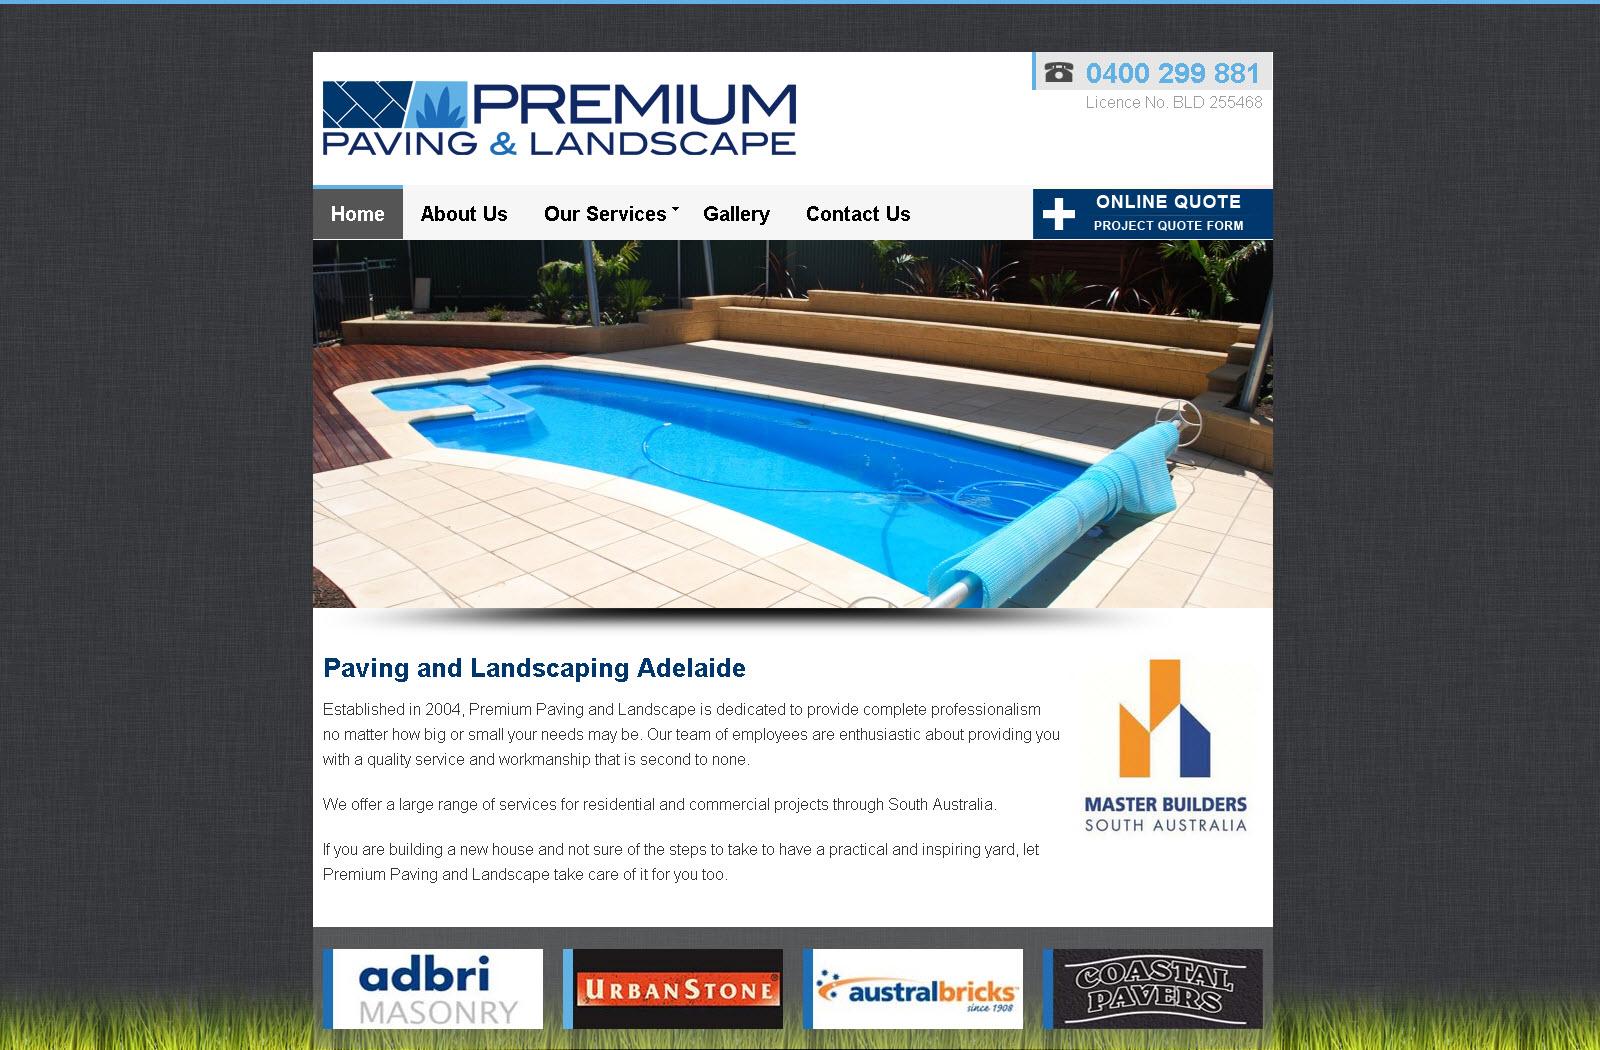 Premium Paving and Landscape